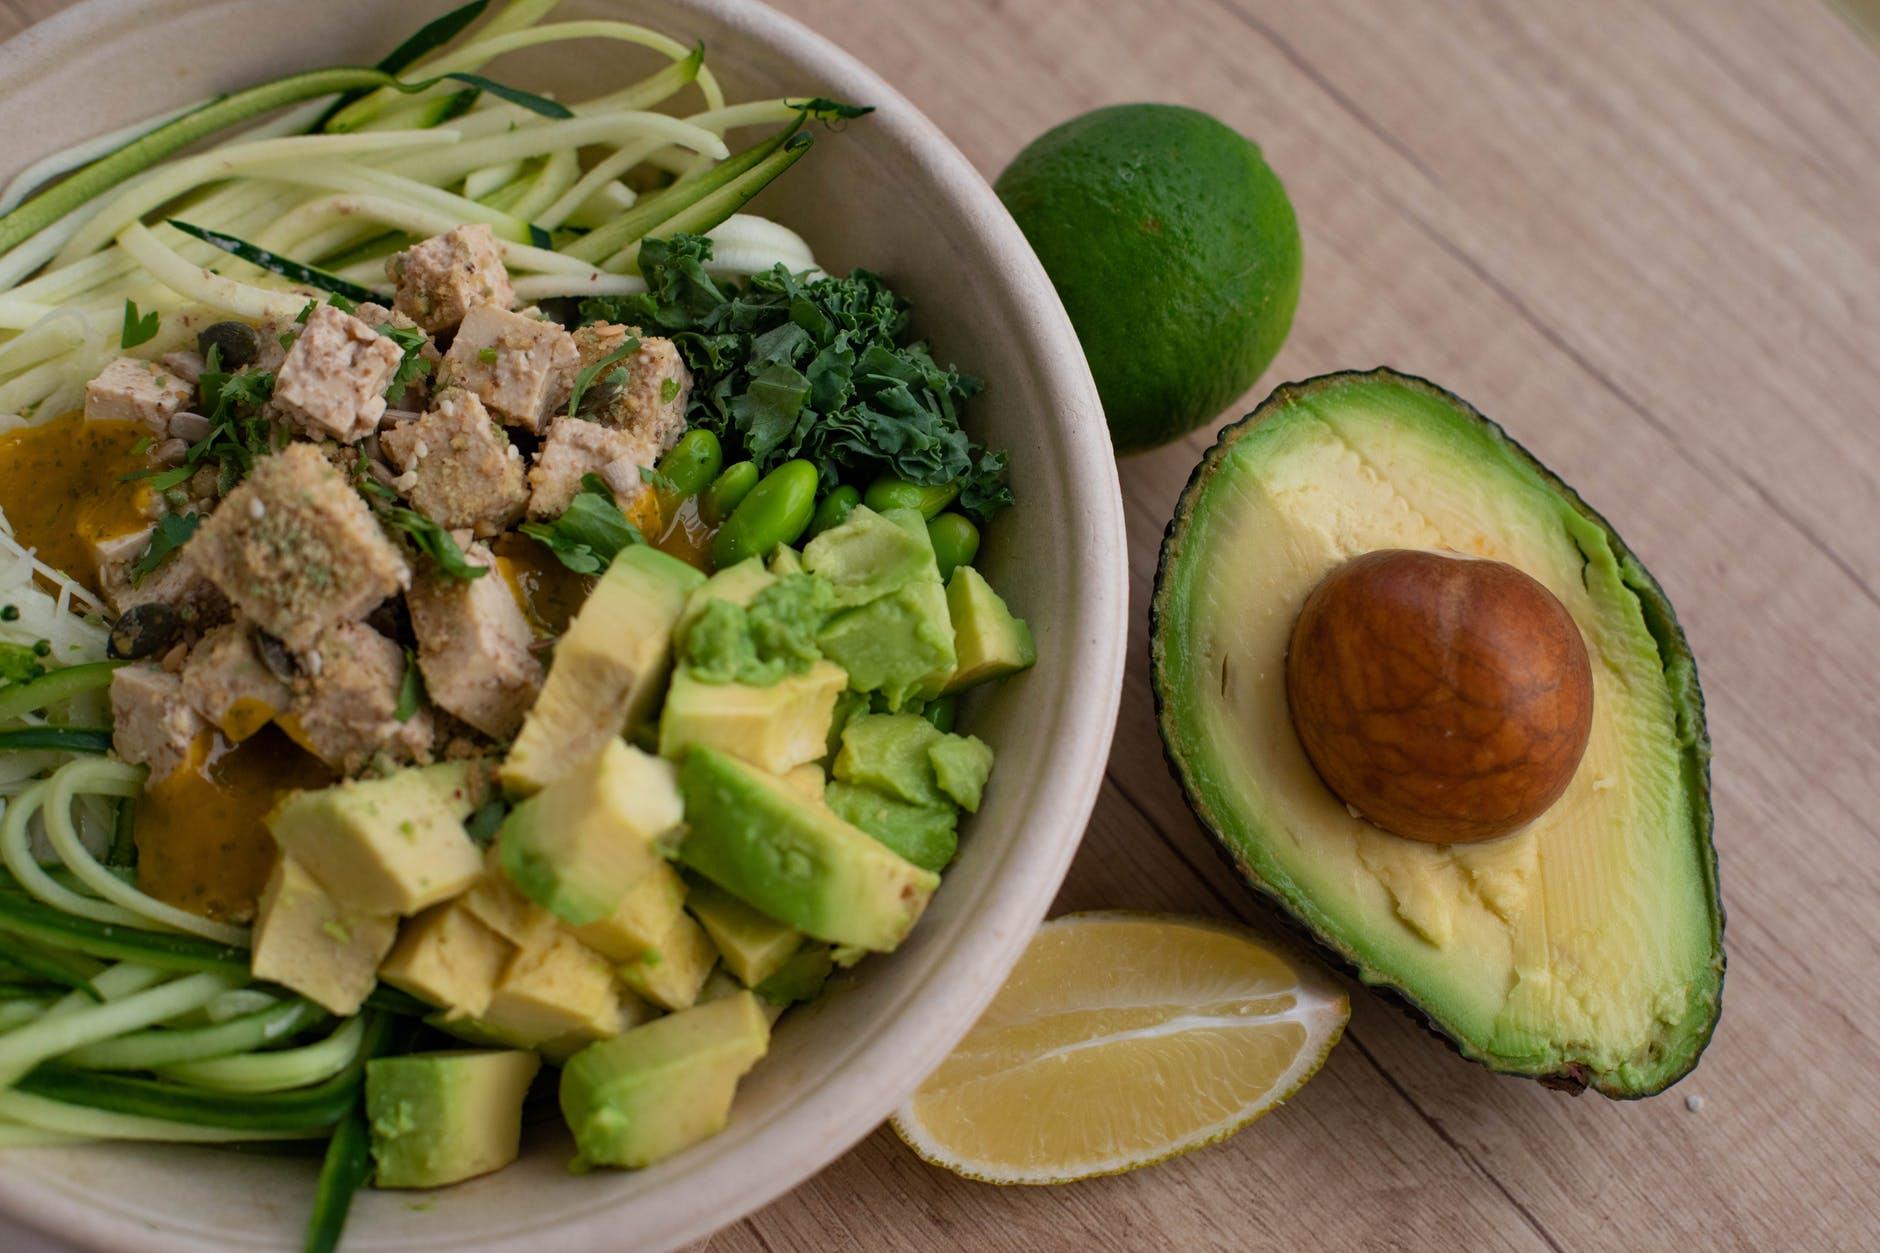 ensaladas frias super ricas, ensalada verde con aguacate, cebollín, atún y lima, ensaladas fáciles de hacer